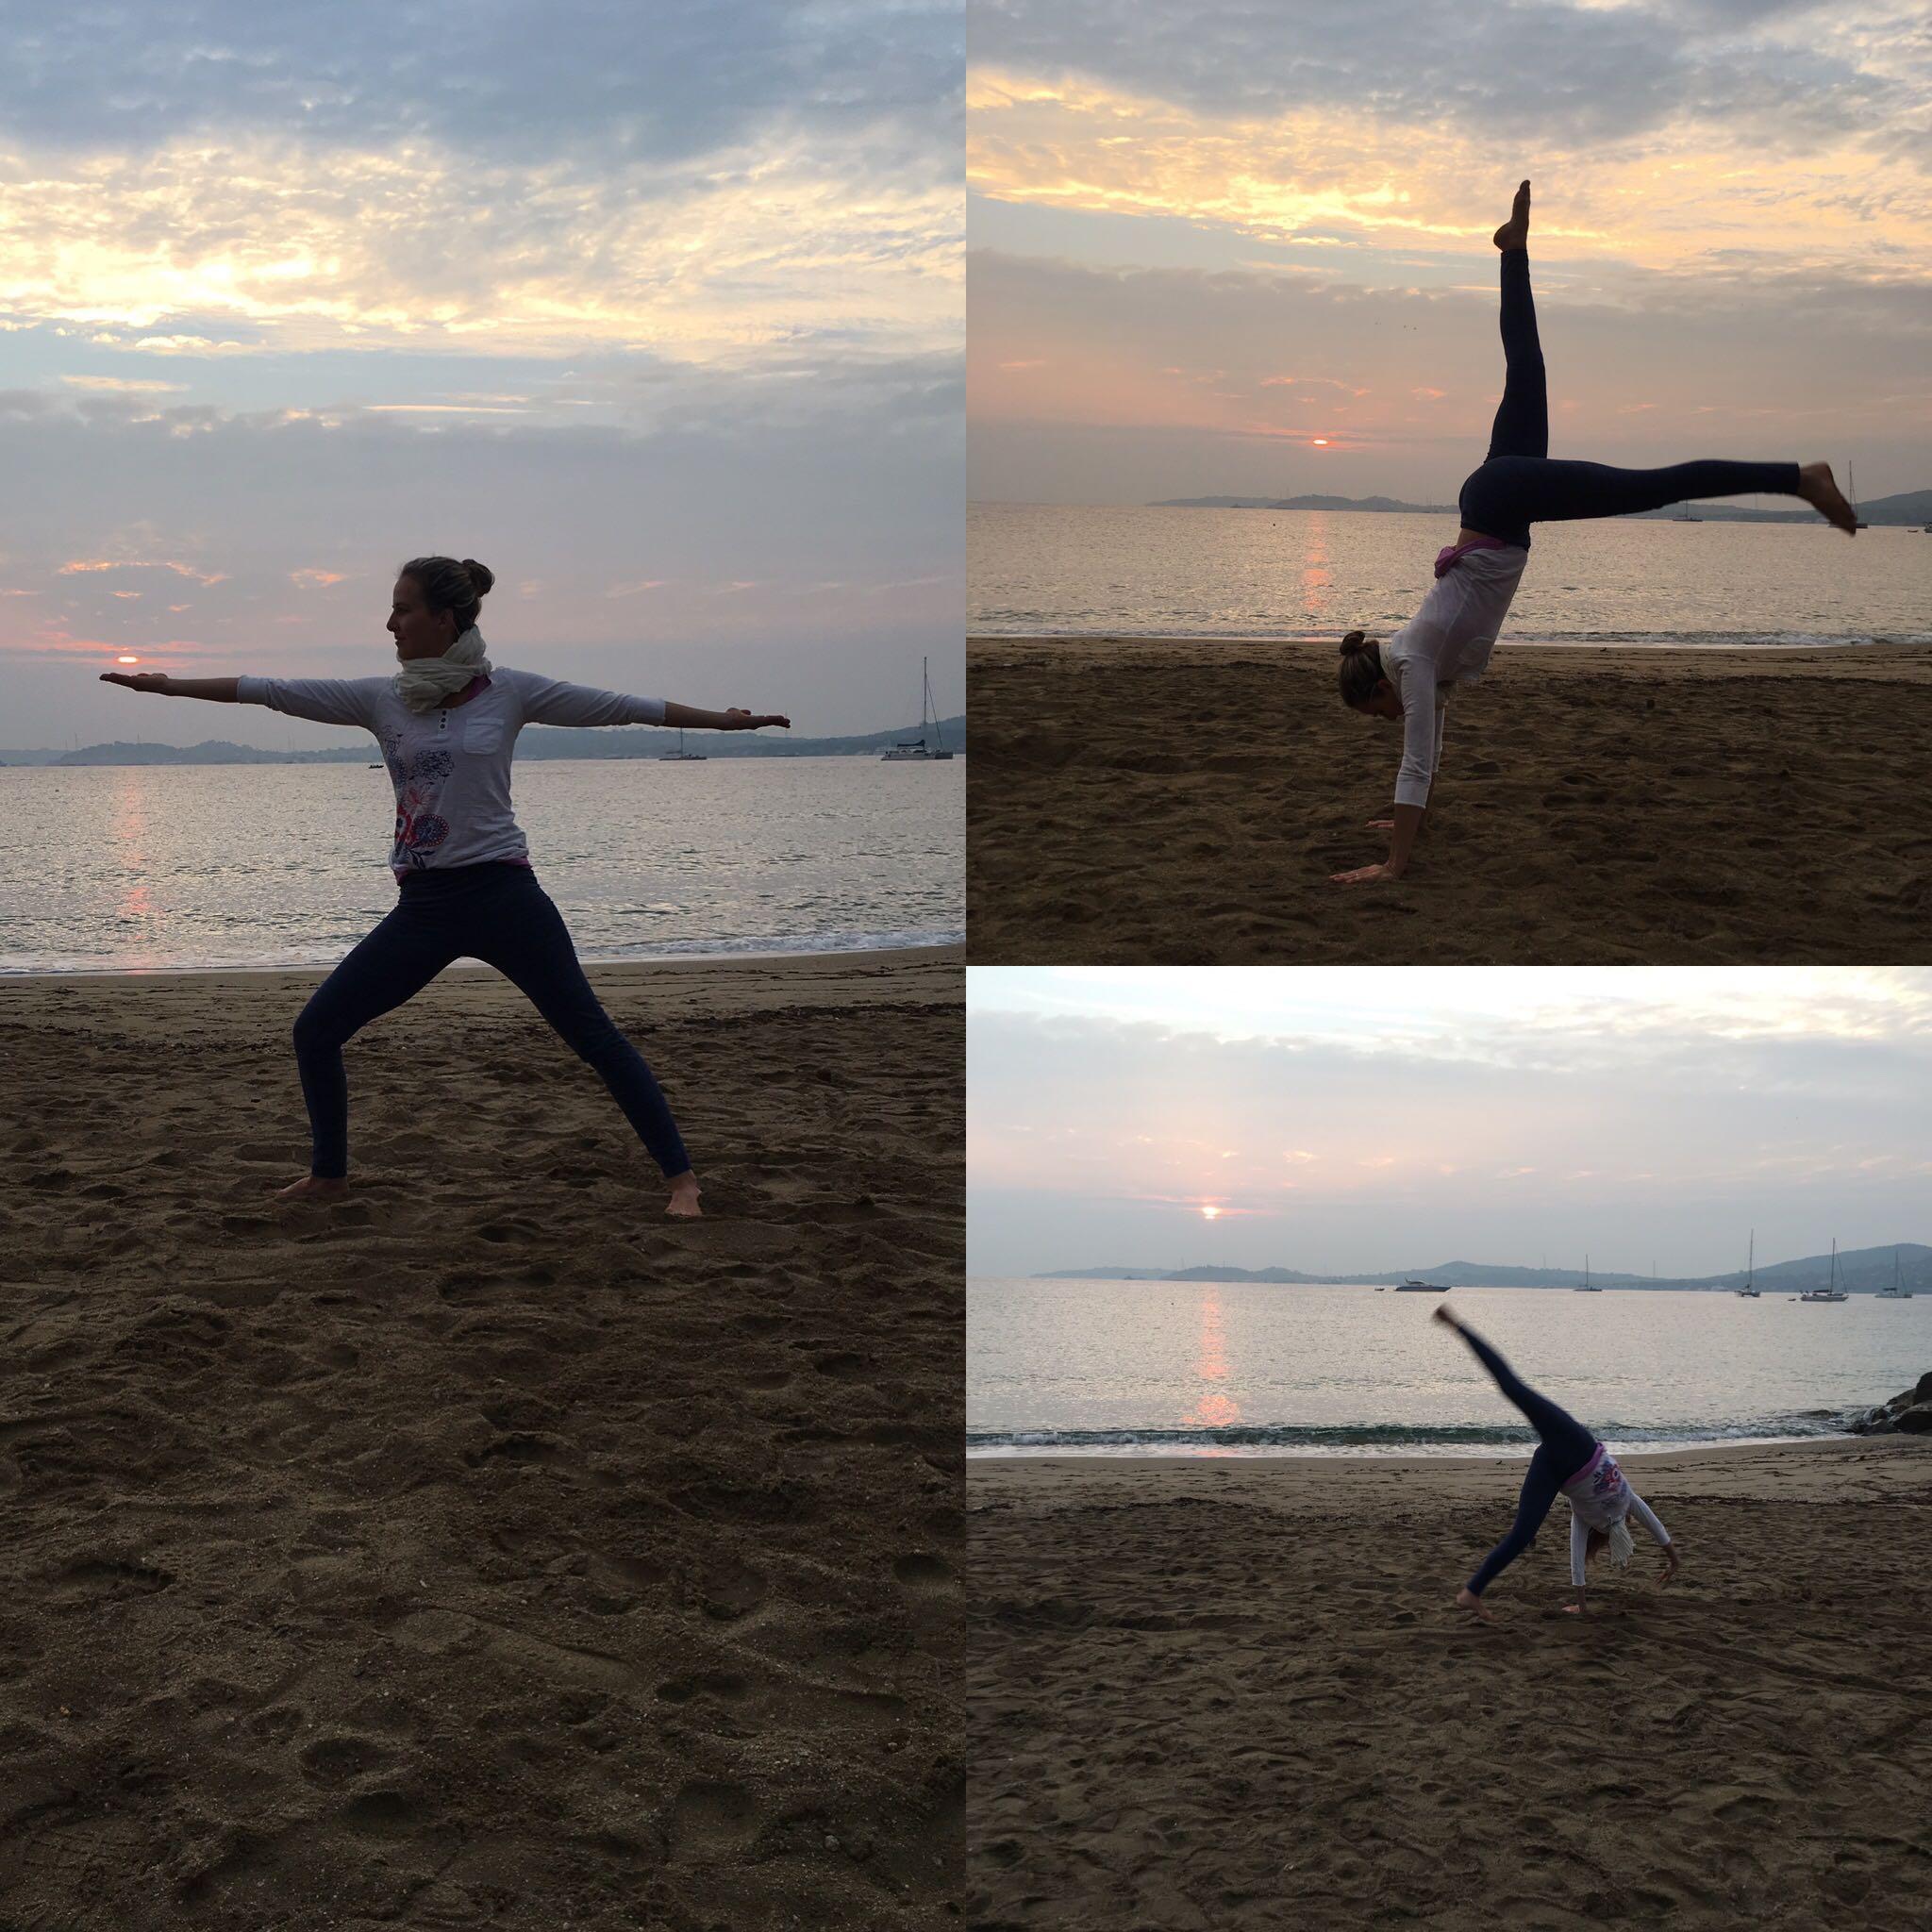 Lotte macht Yoga am Strand - gegen den dicken Bauch